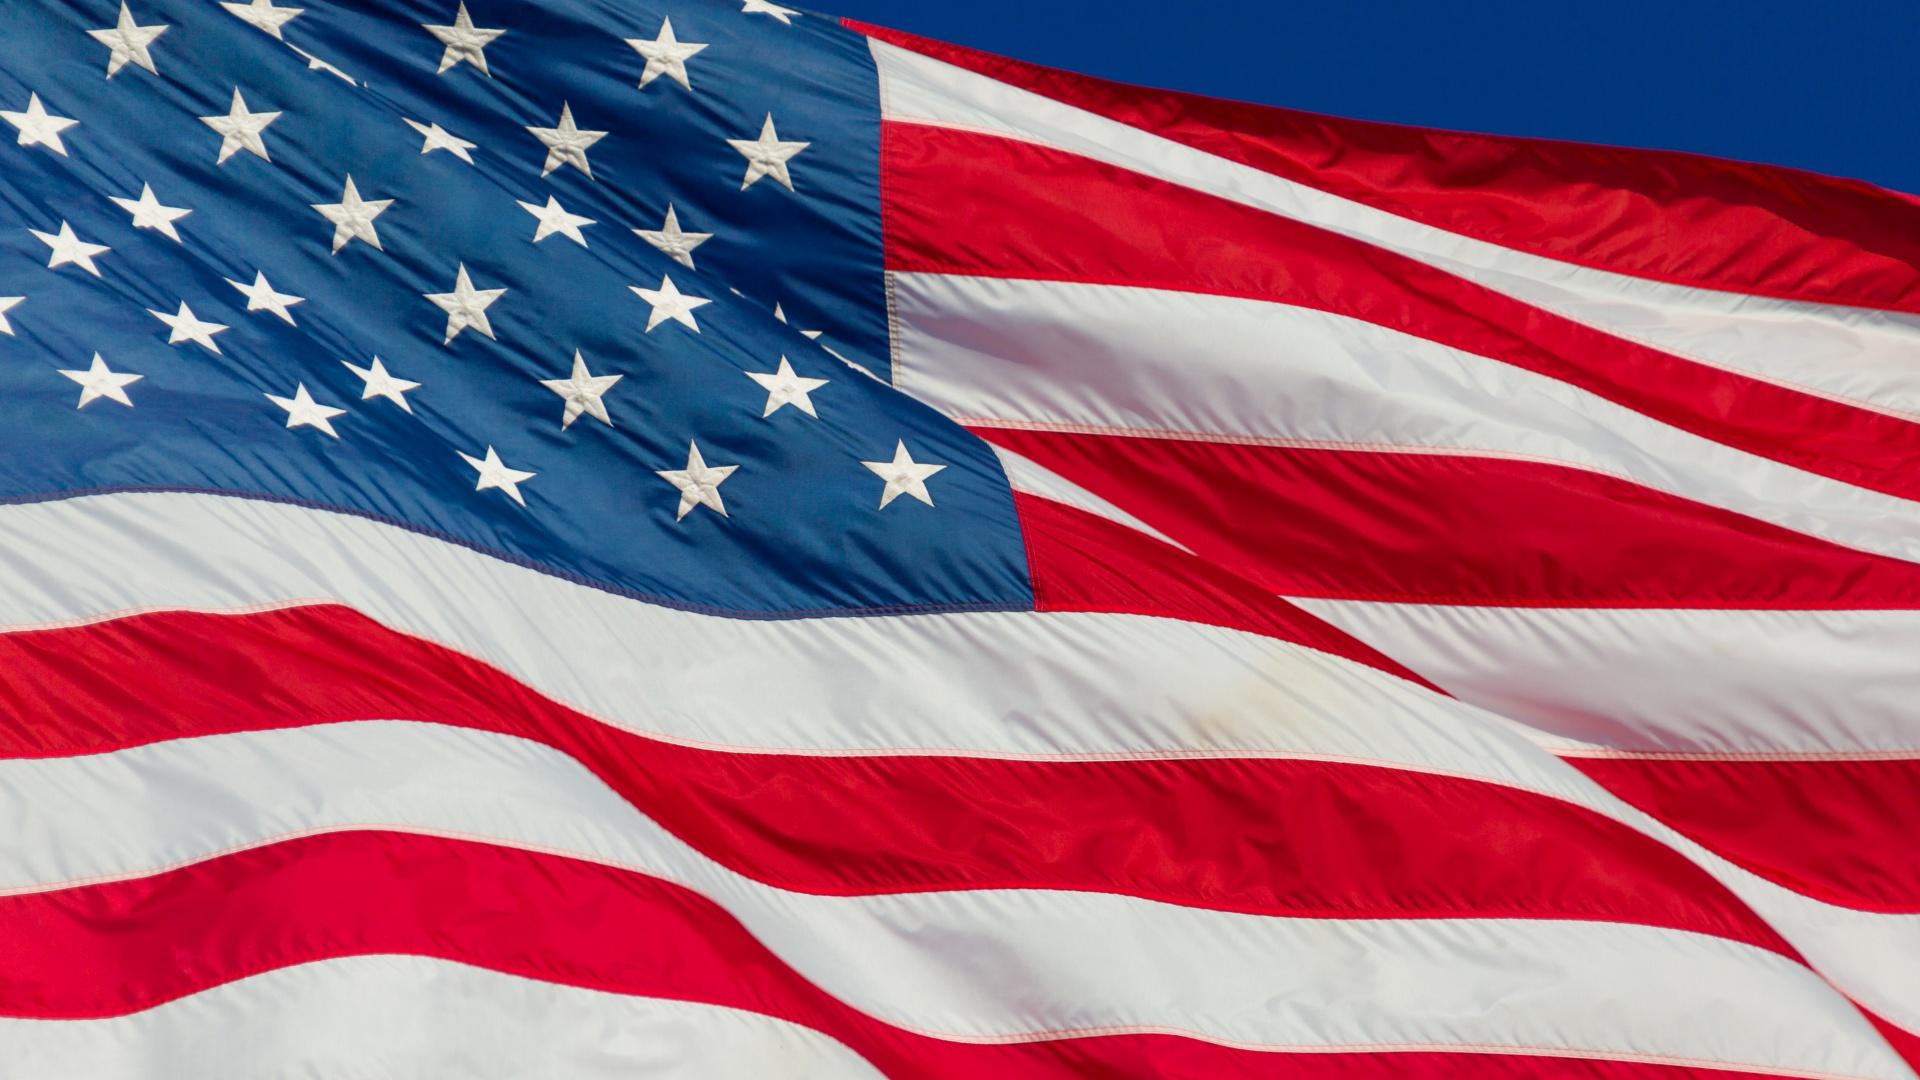 United States of America Flag, Pledge of Allegiance, Flag